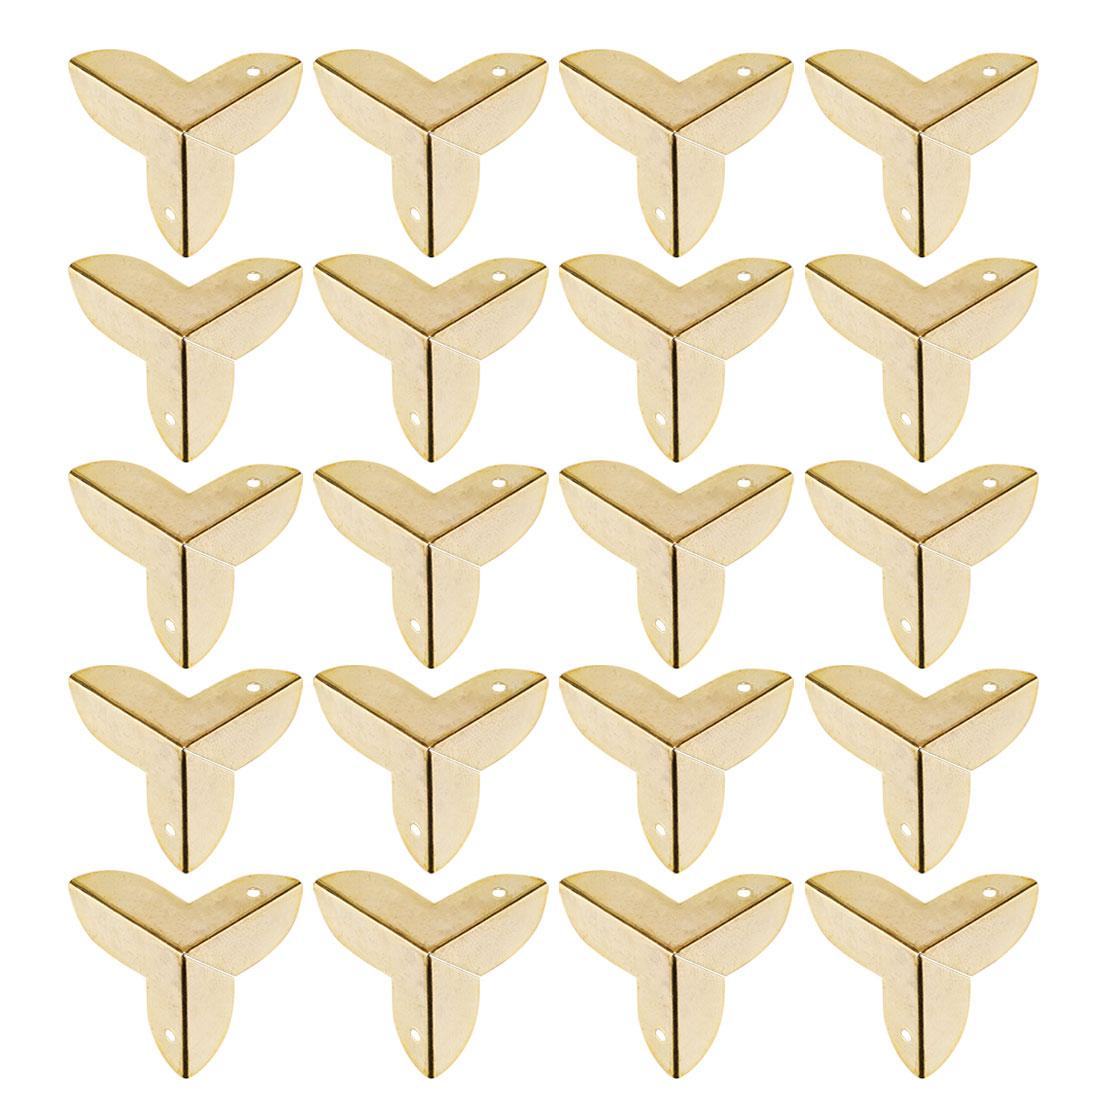 20pcs Box Corner Protector Gold Tone Triangle Frame Desk Box Furniture Protector